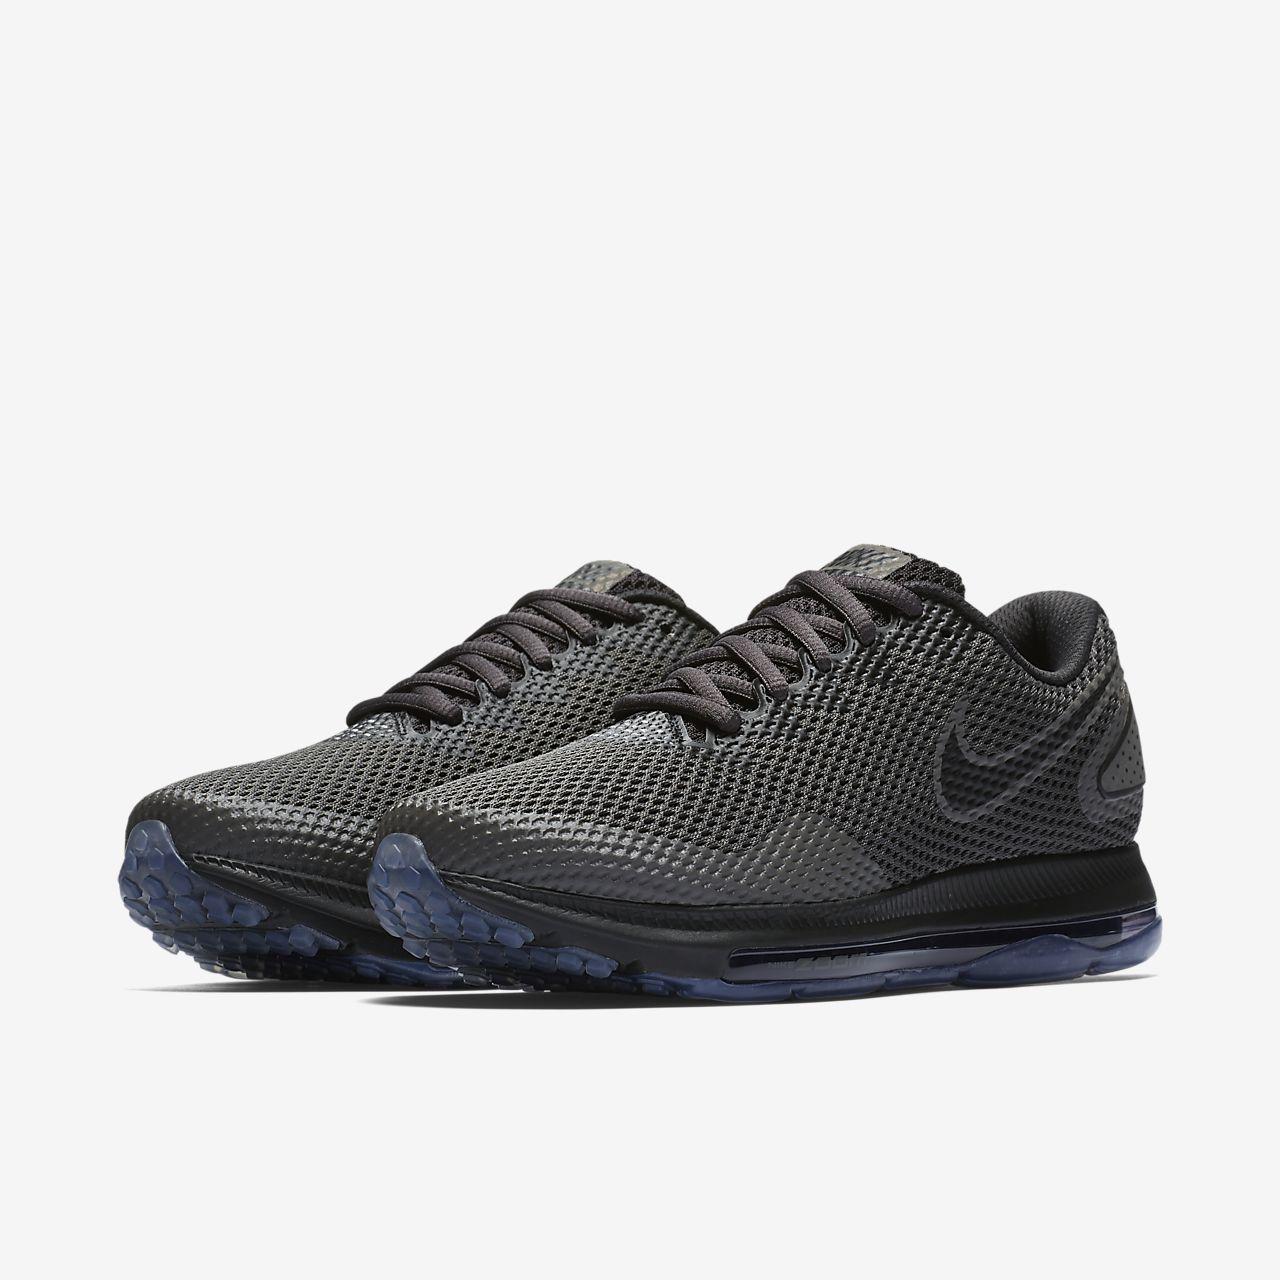 3717564829ded Nike Zoom All Out Low 2 Kadın Koşu Ayakkabısı. Nike.com TR